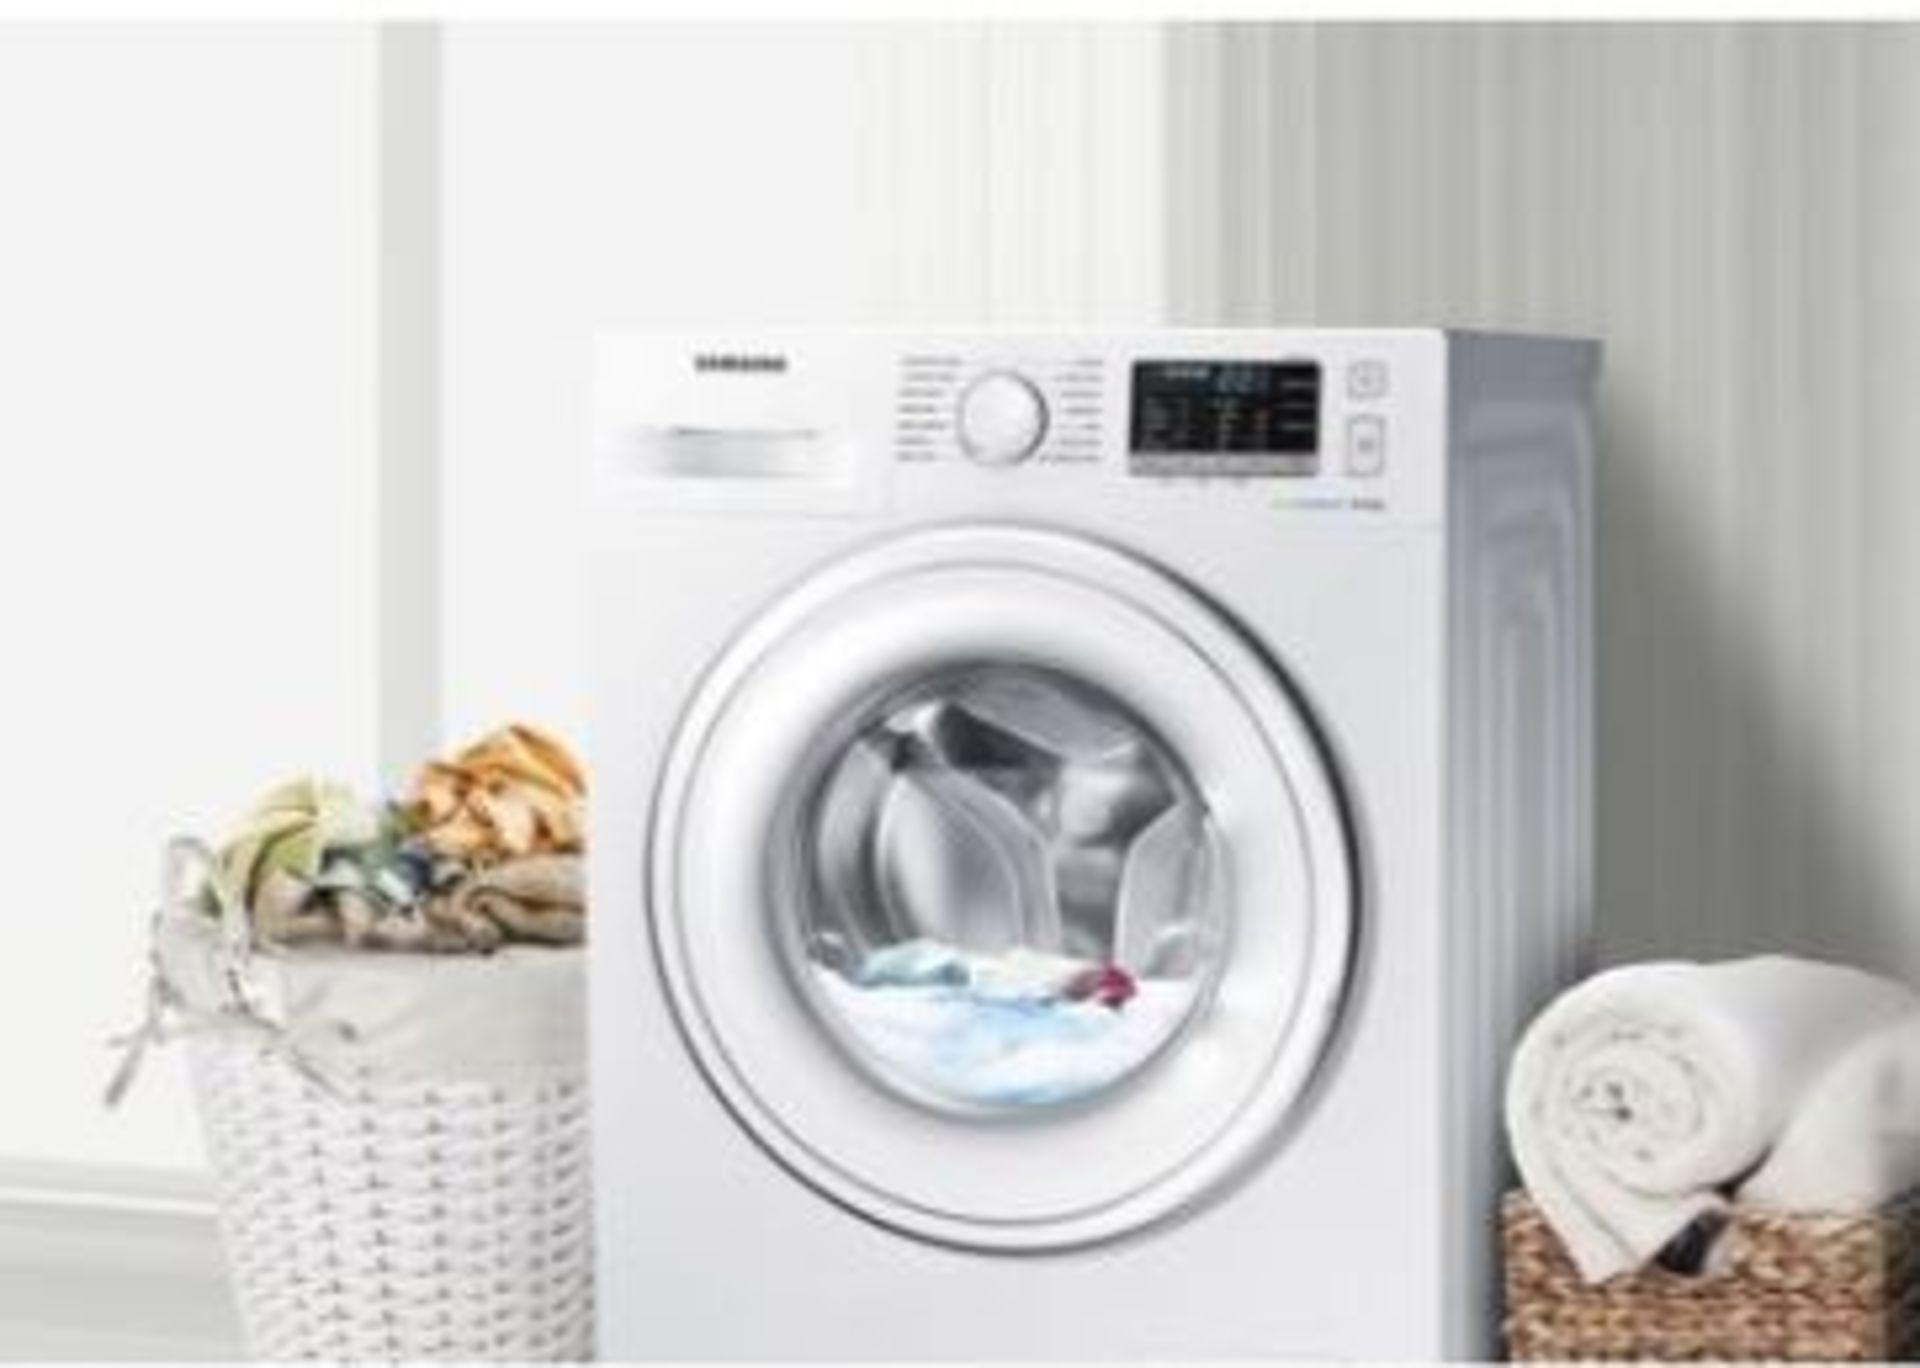 Pallet of 1 Samsung Premium Washing machine. Latest selling price £339* - Image 3 of 8